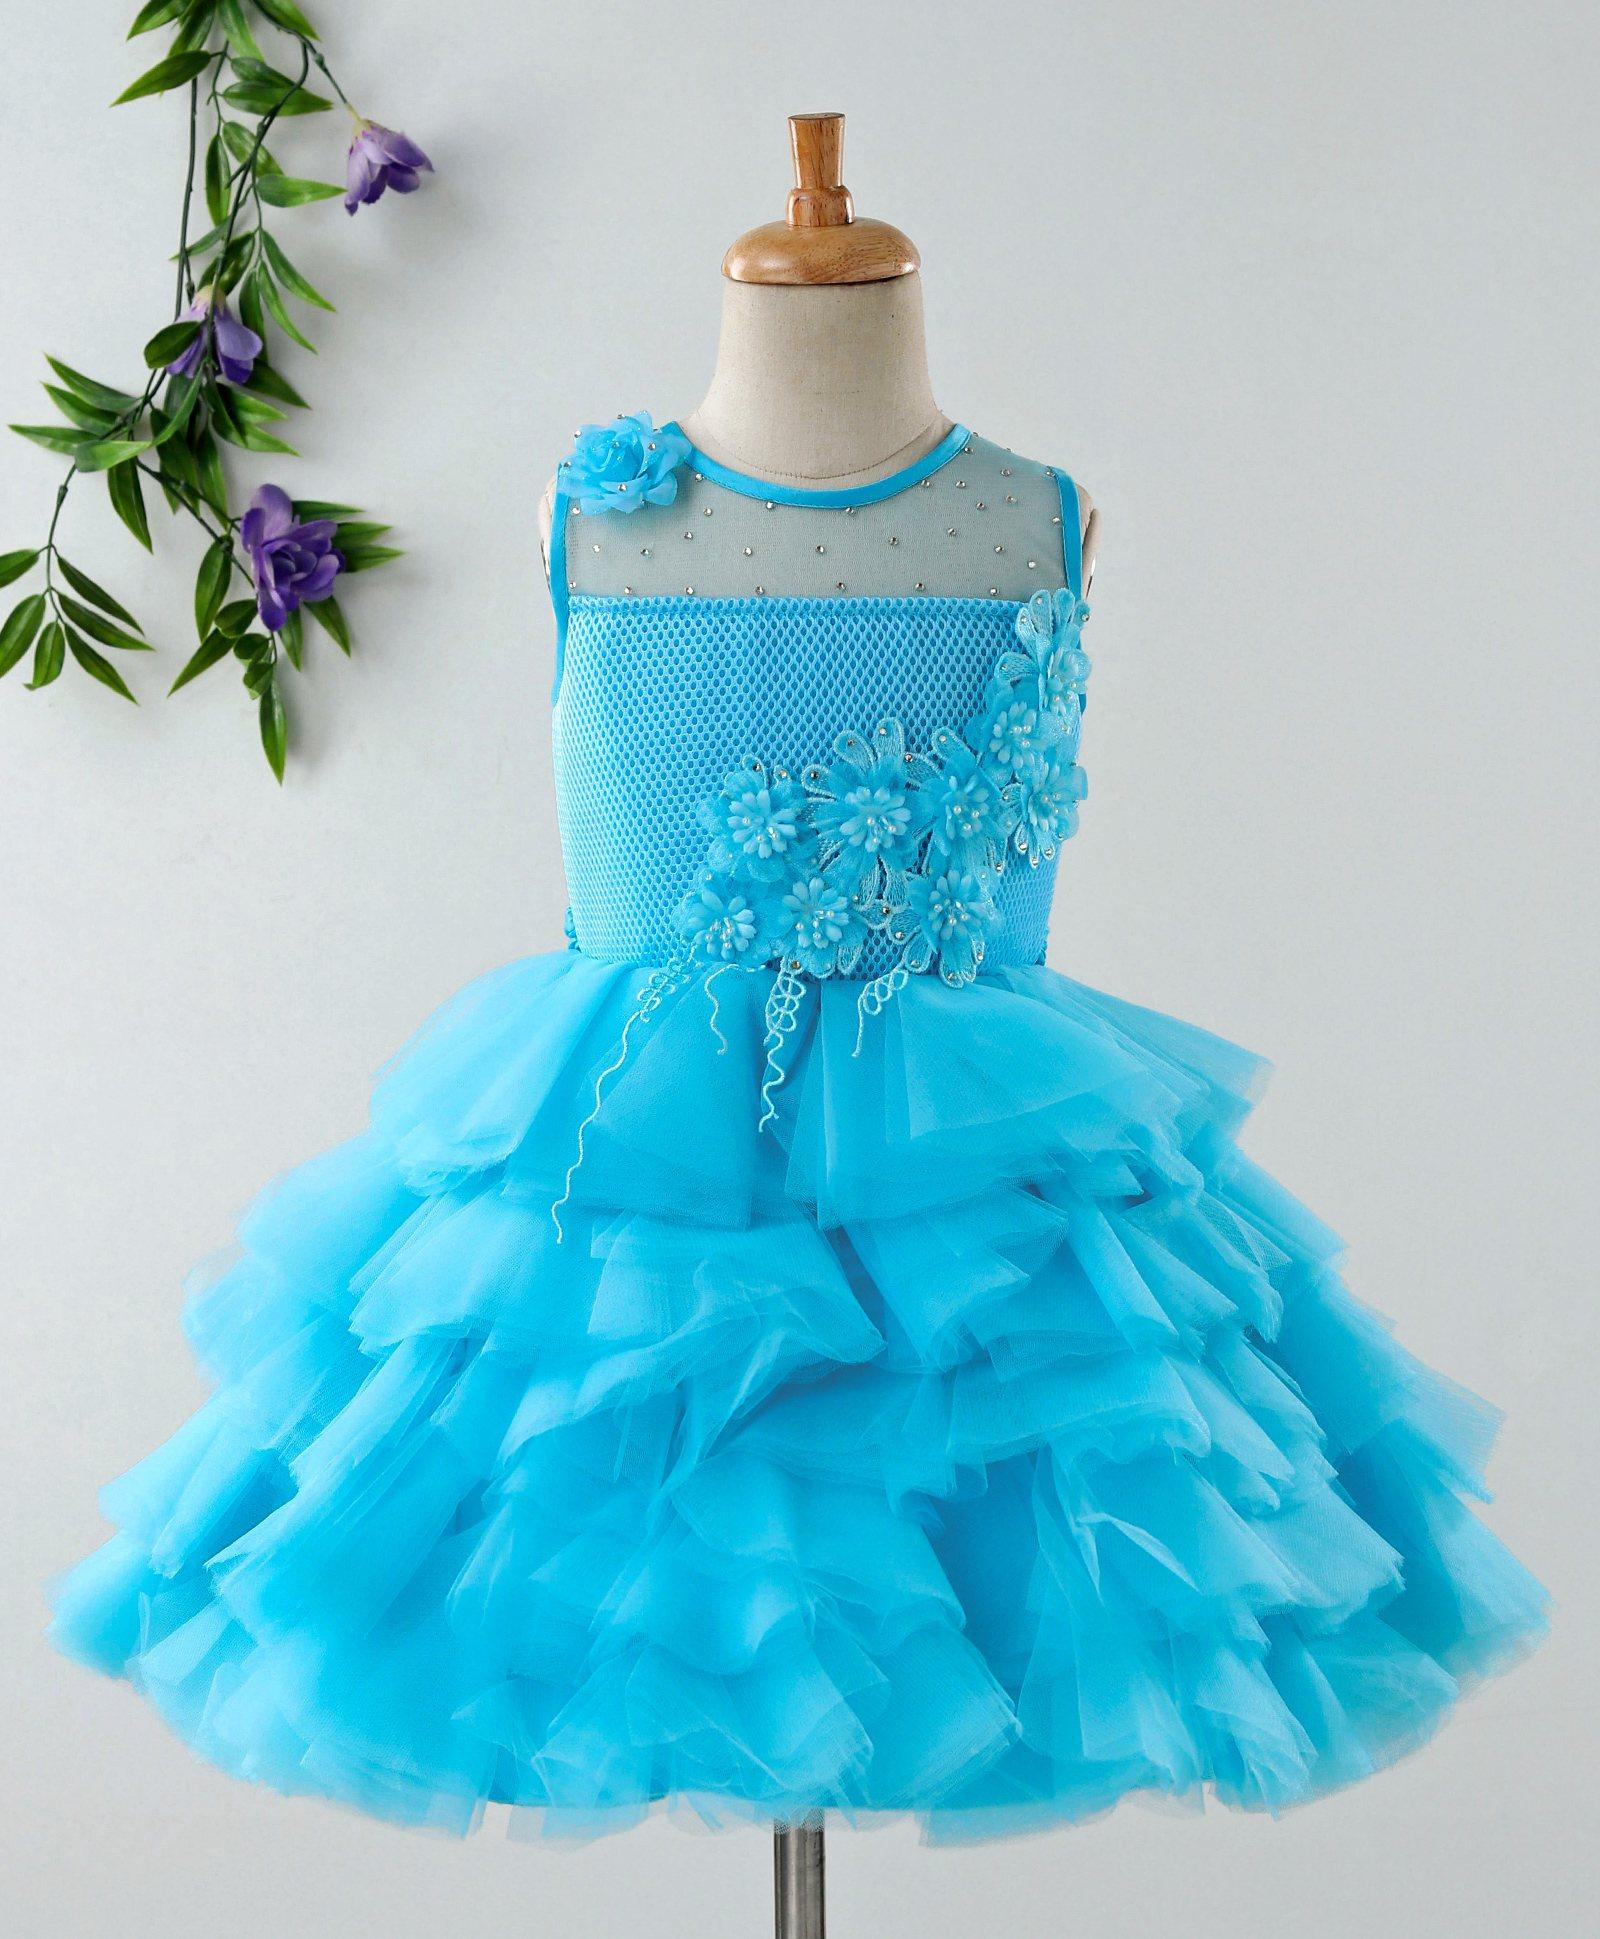 558cbb7ae75 Buy Babyhug Sleeveless Net Layered Party Frock Blue for Girls (3-6 ...